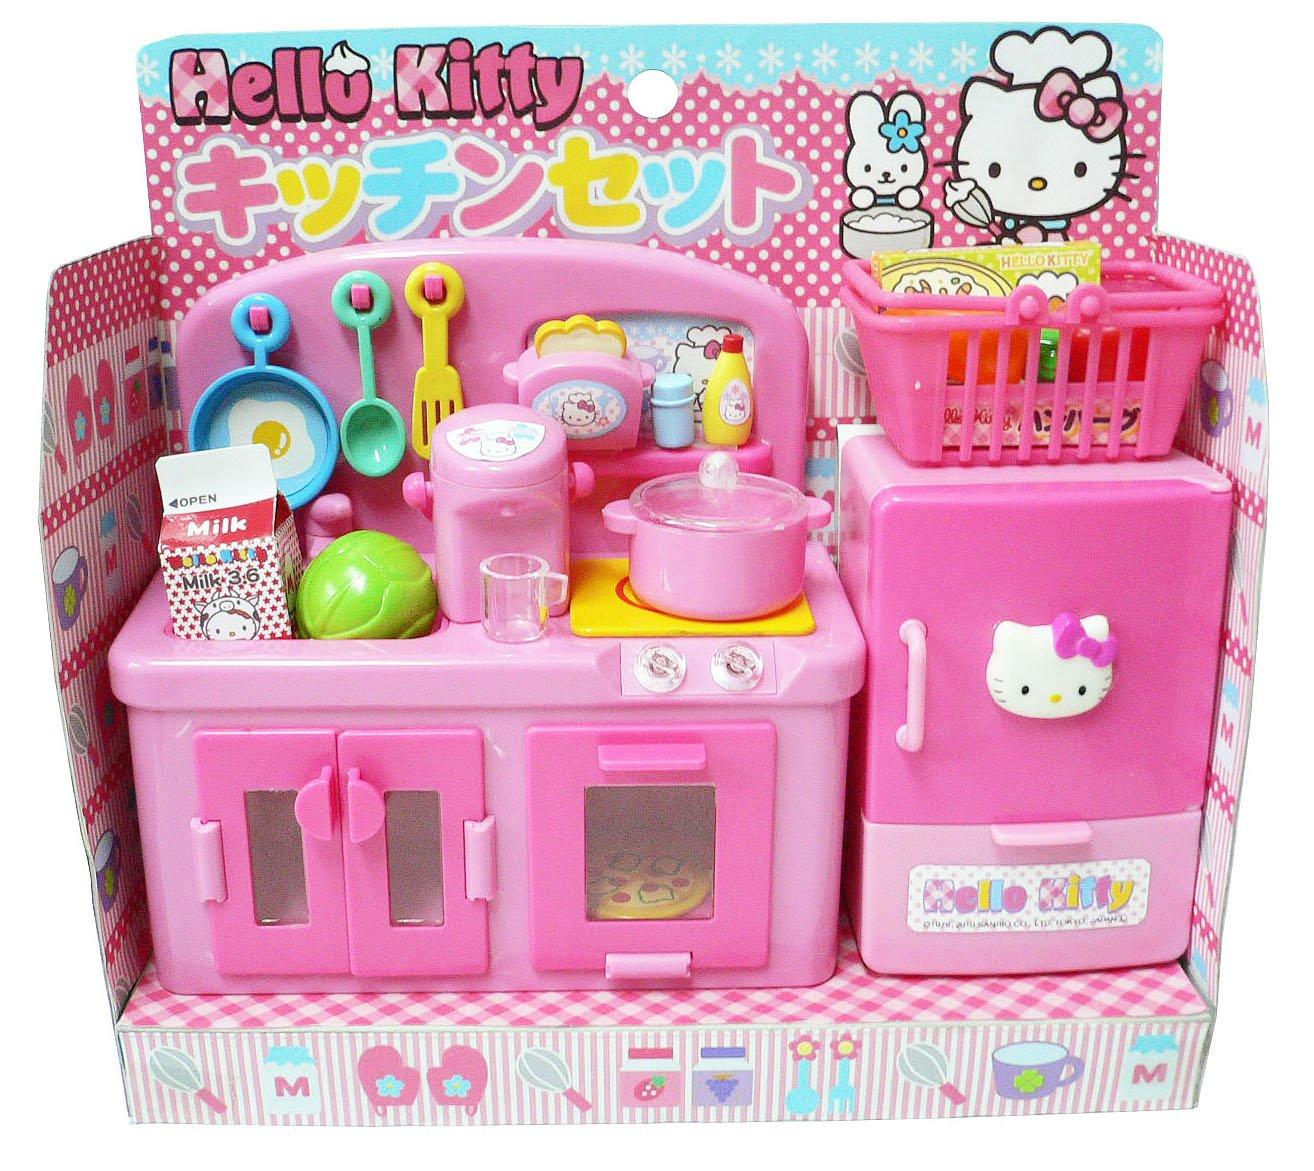 Amazon.com: Hello Kitty Kitchen Play Set Miniature Toy Preschool ...